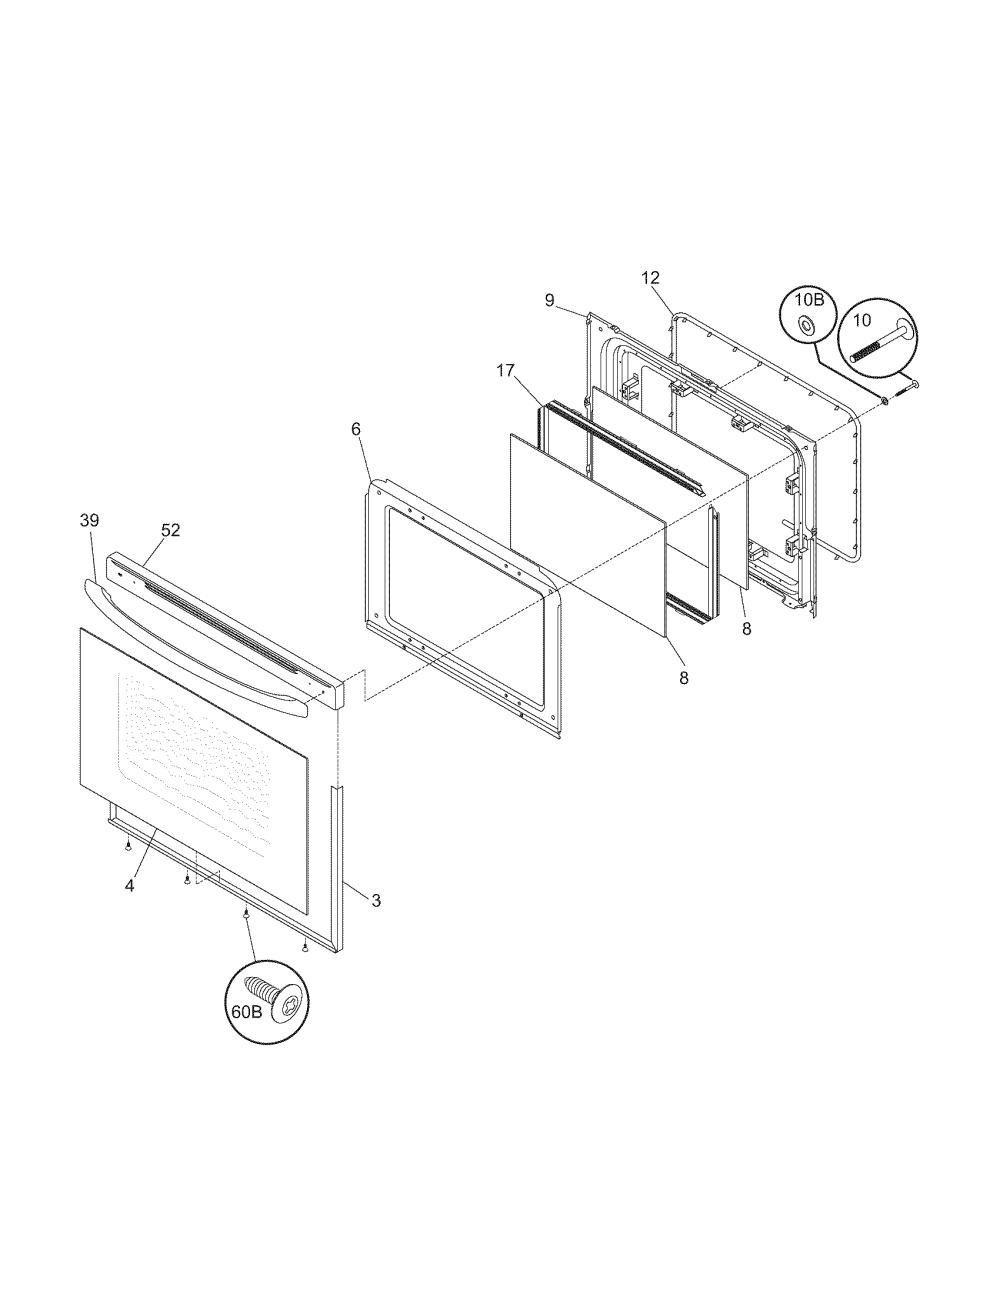 medium resolution of 79095042503 electric range door parts diagram